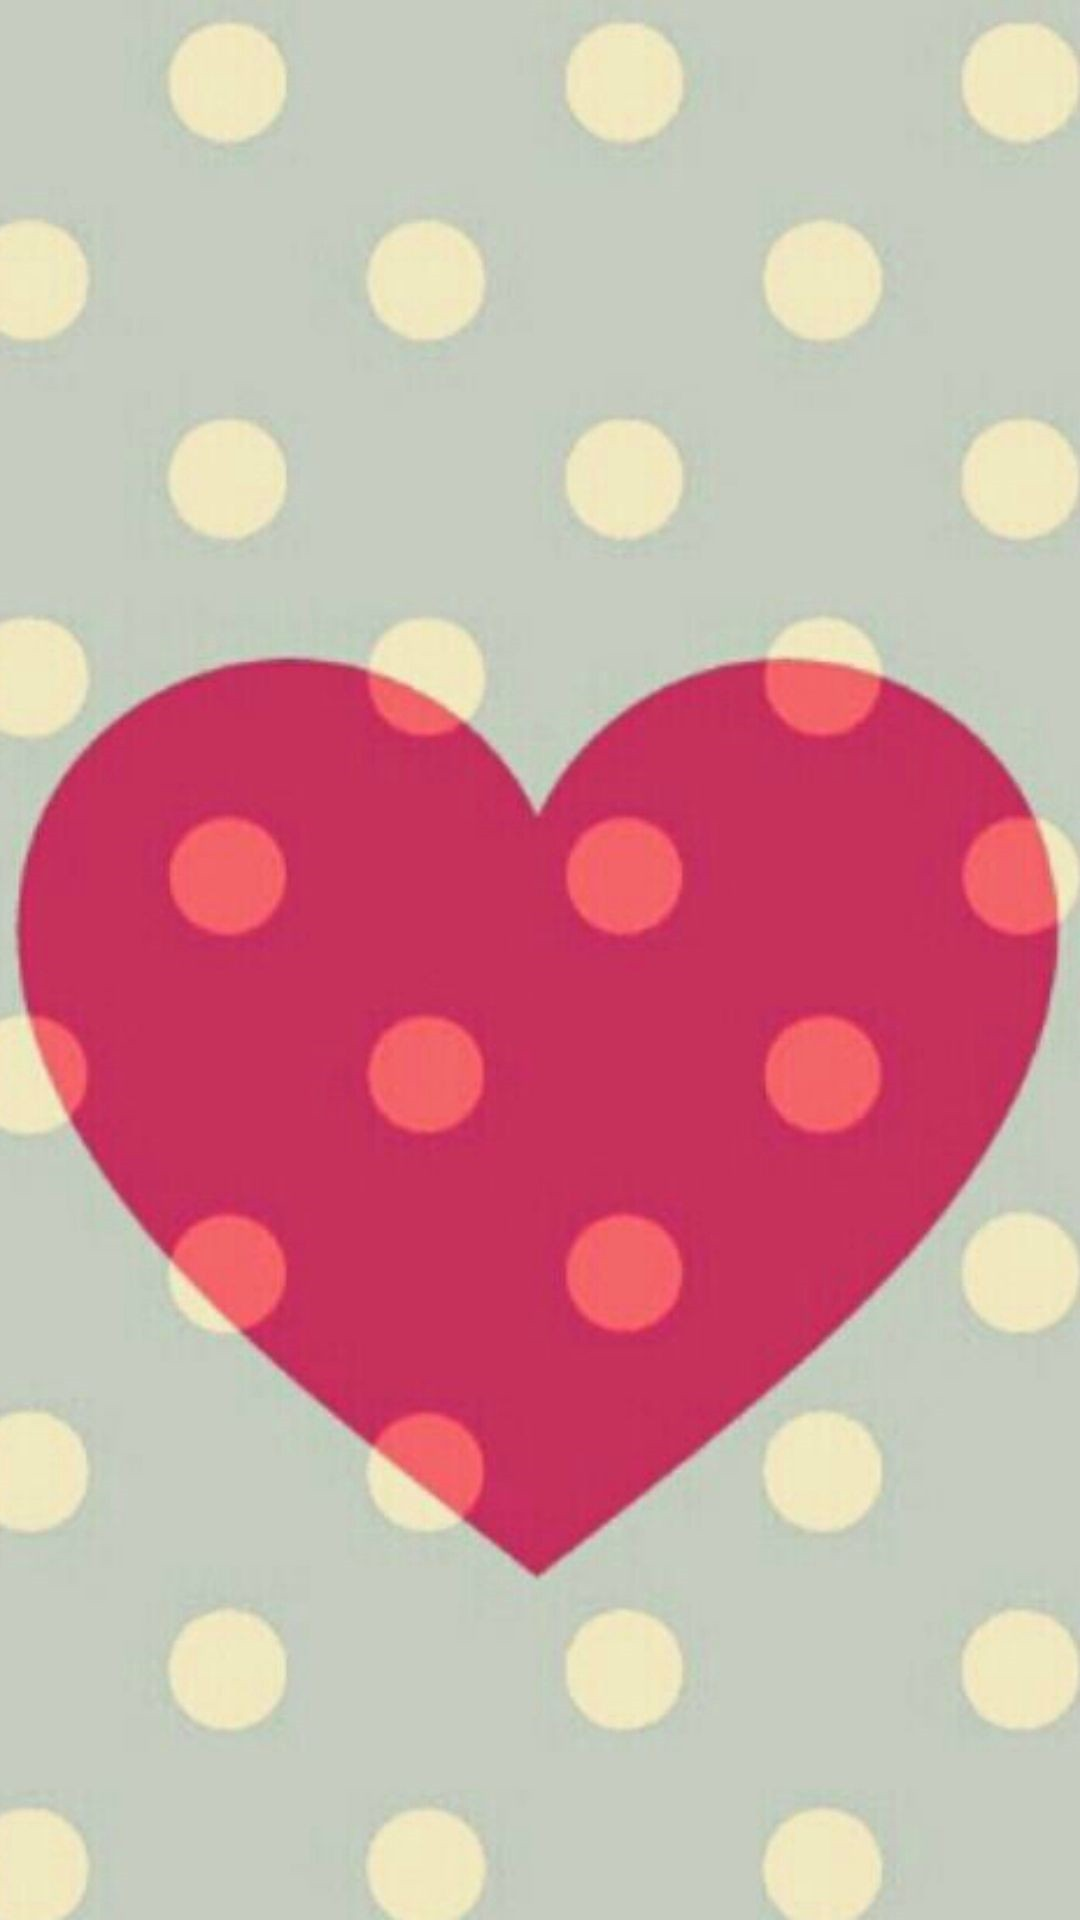 Valentines ios wallpaper